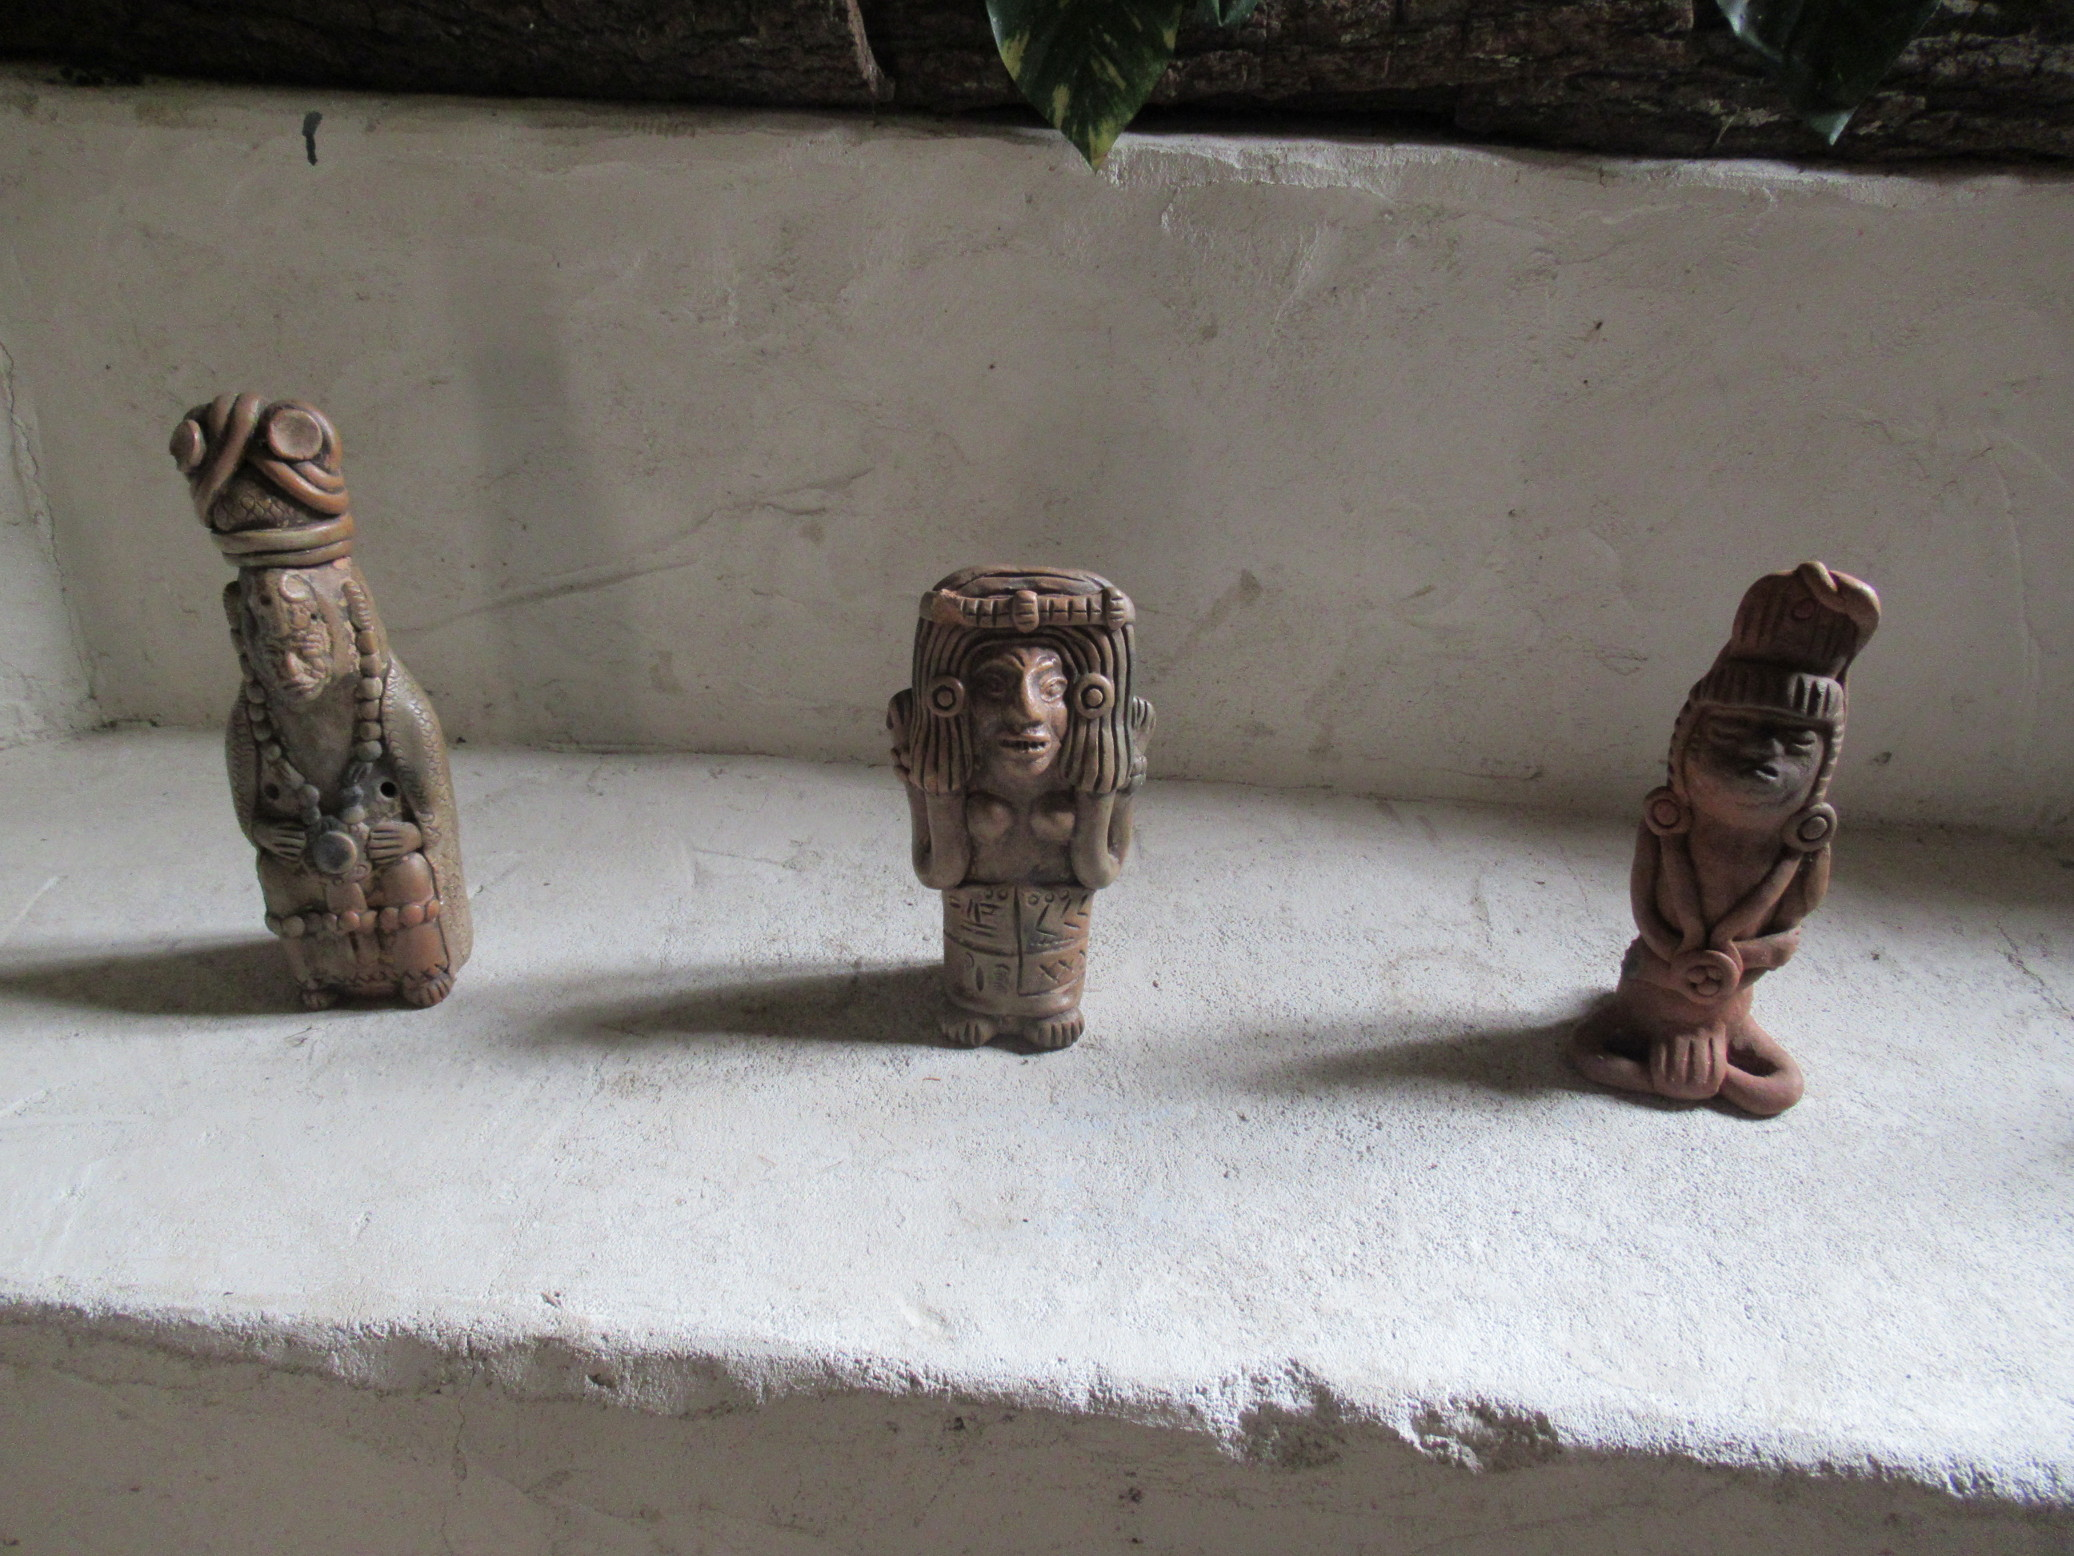 mayan whistle